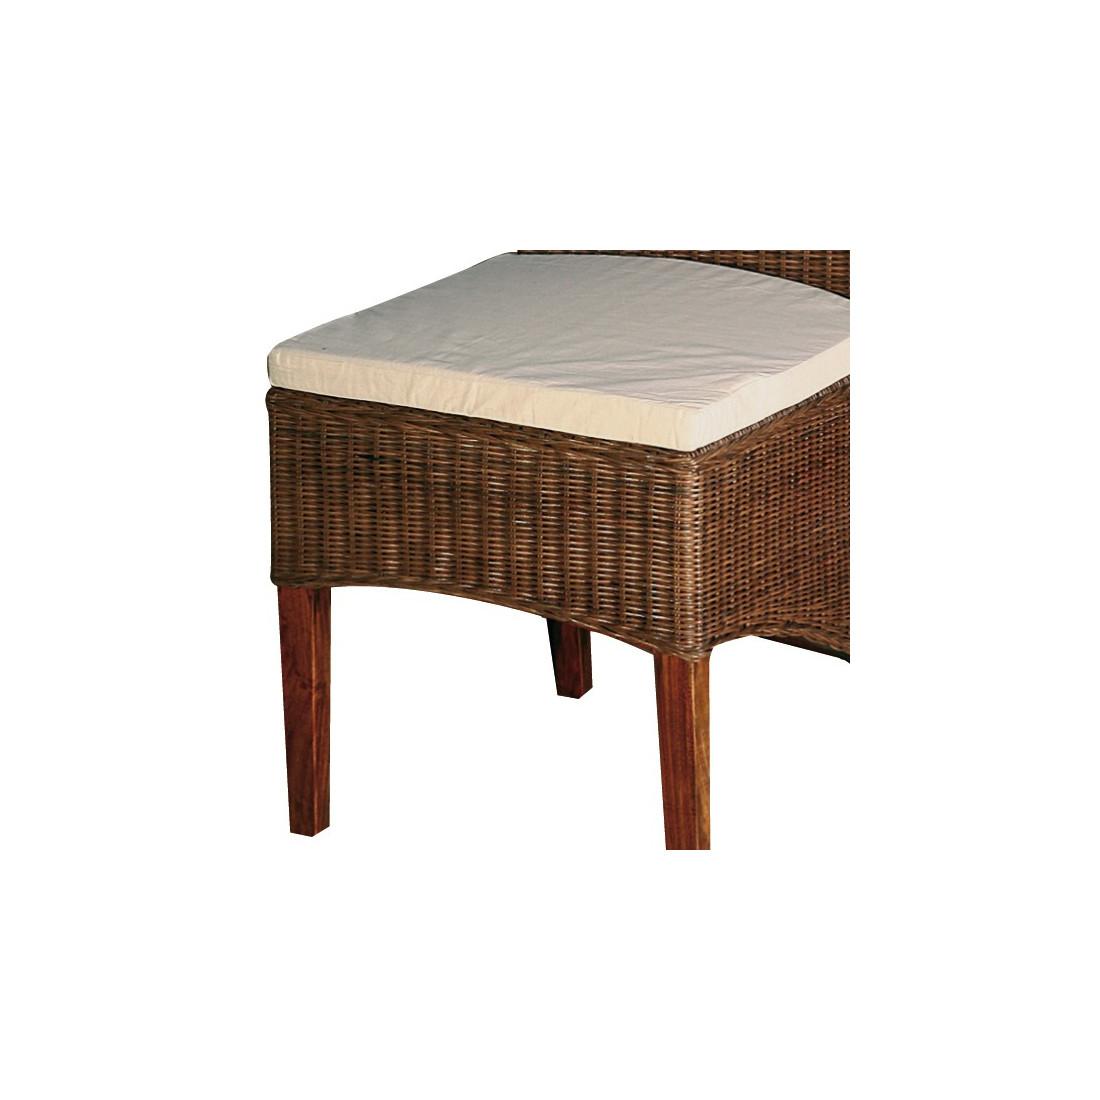 chaise rotin coussin leia univers assises tousmesmeubles. Black Bedroom Furniture Sets. Home Design Ideas